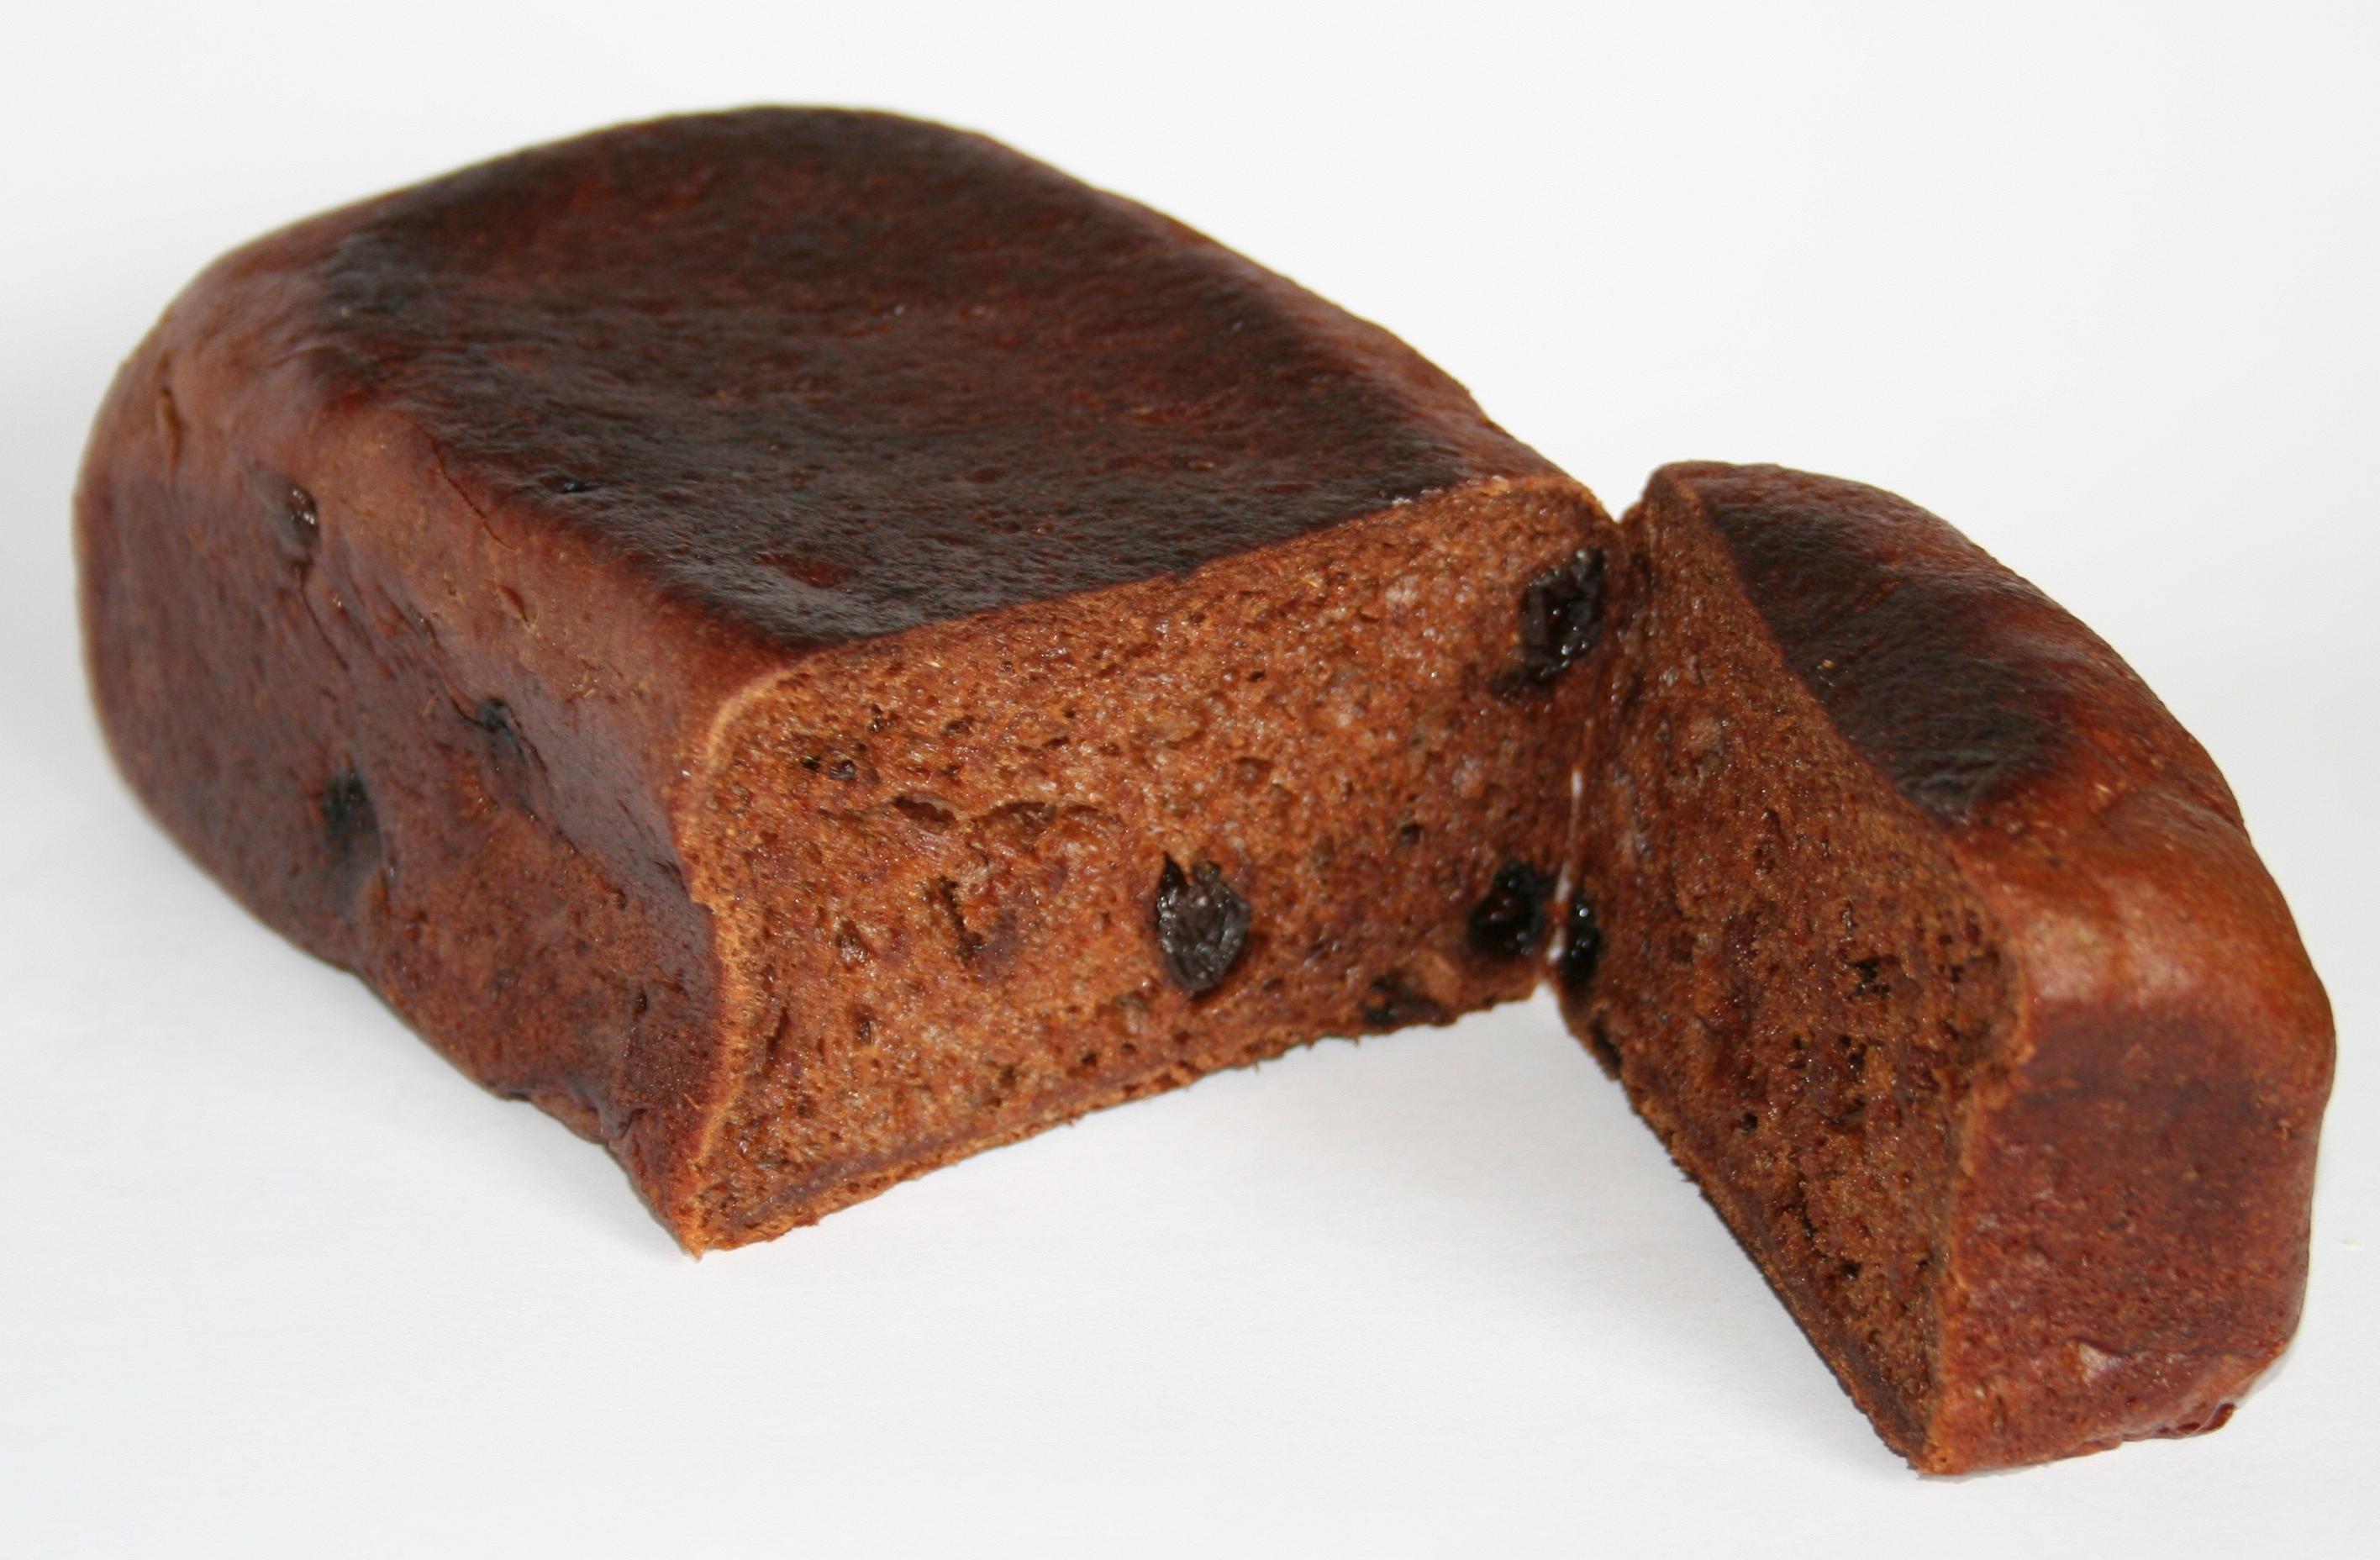 File:Malt loaf.jpeg - Wikipedia